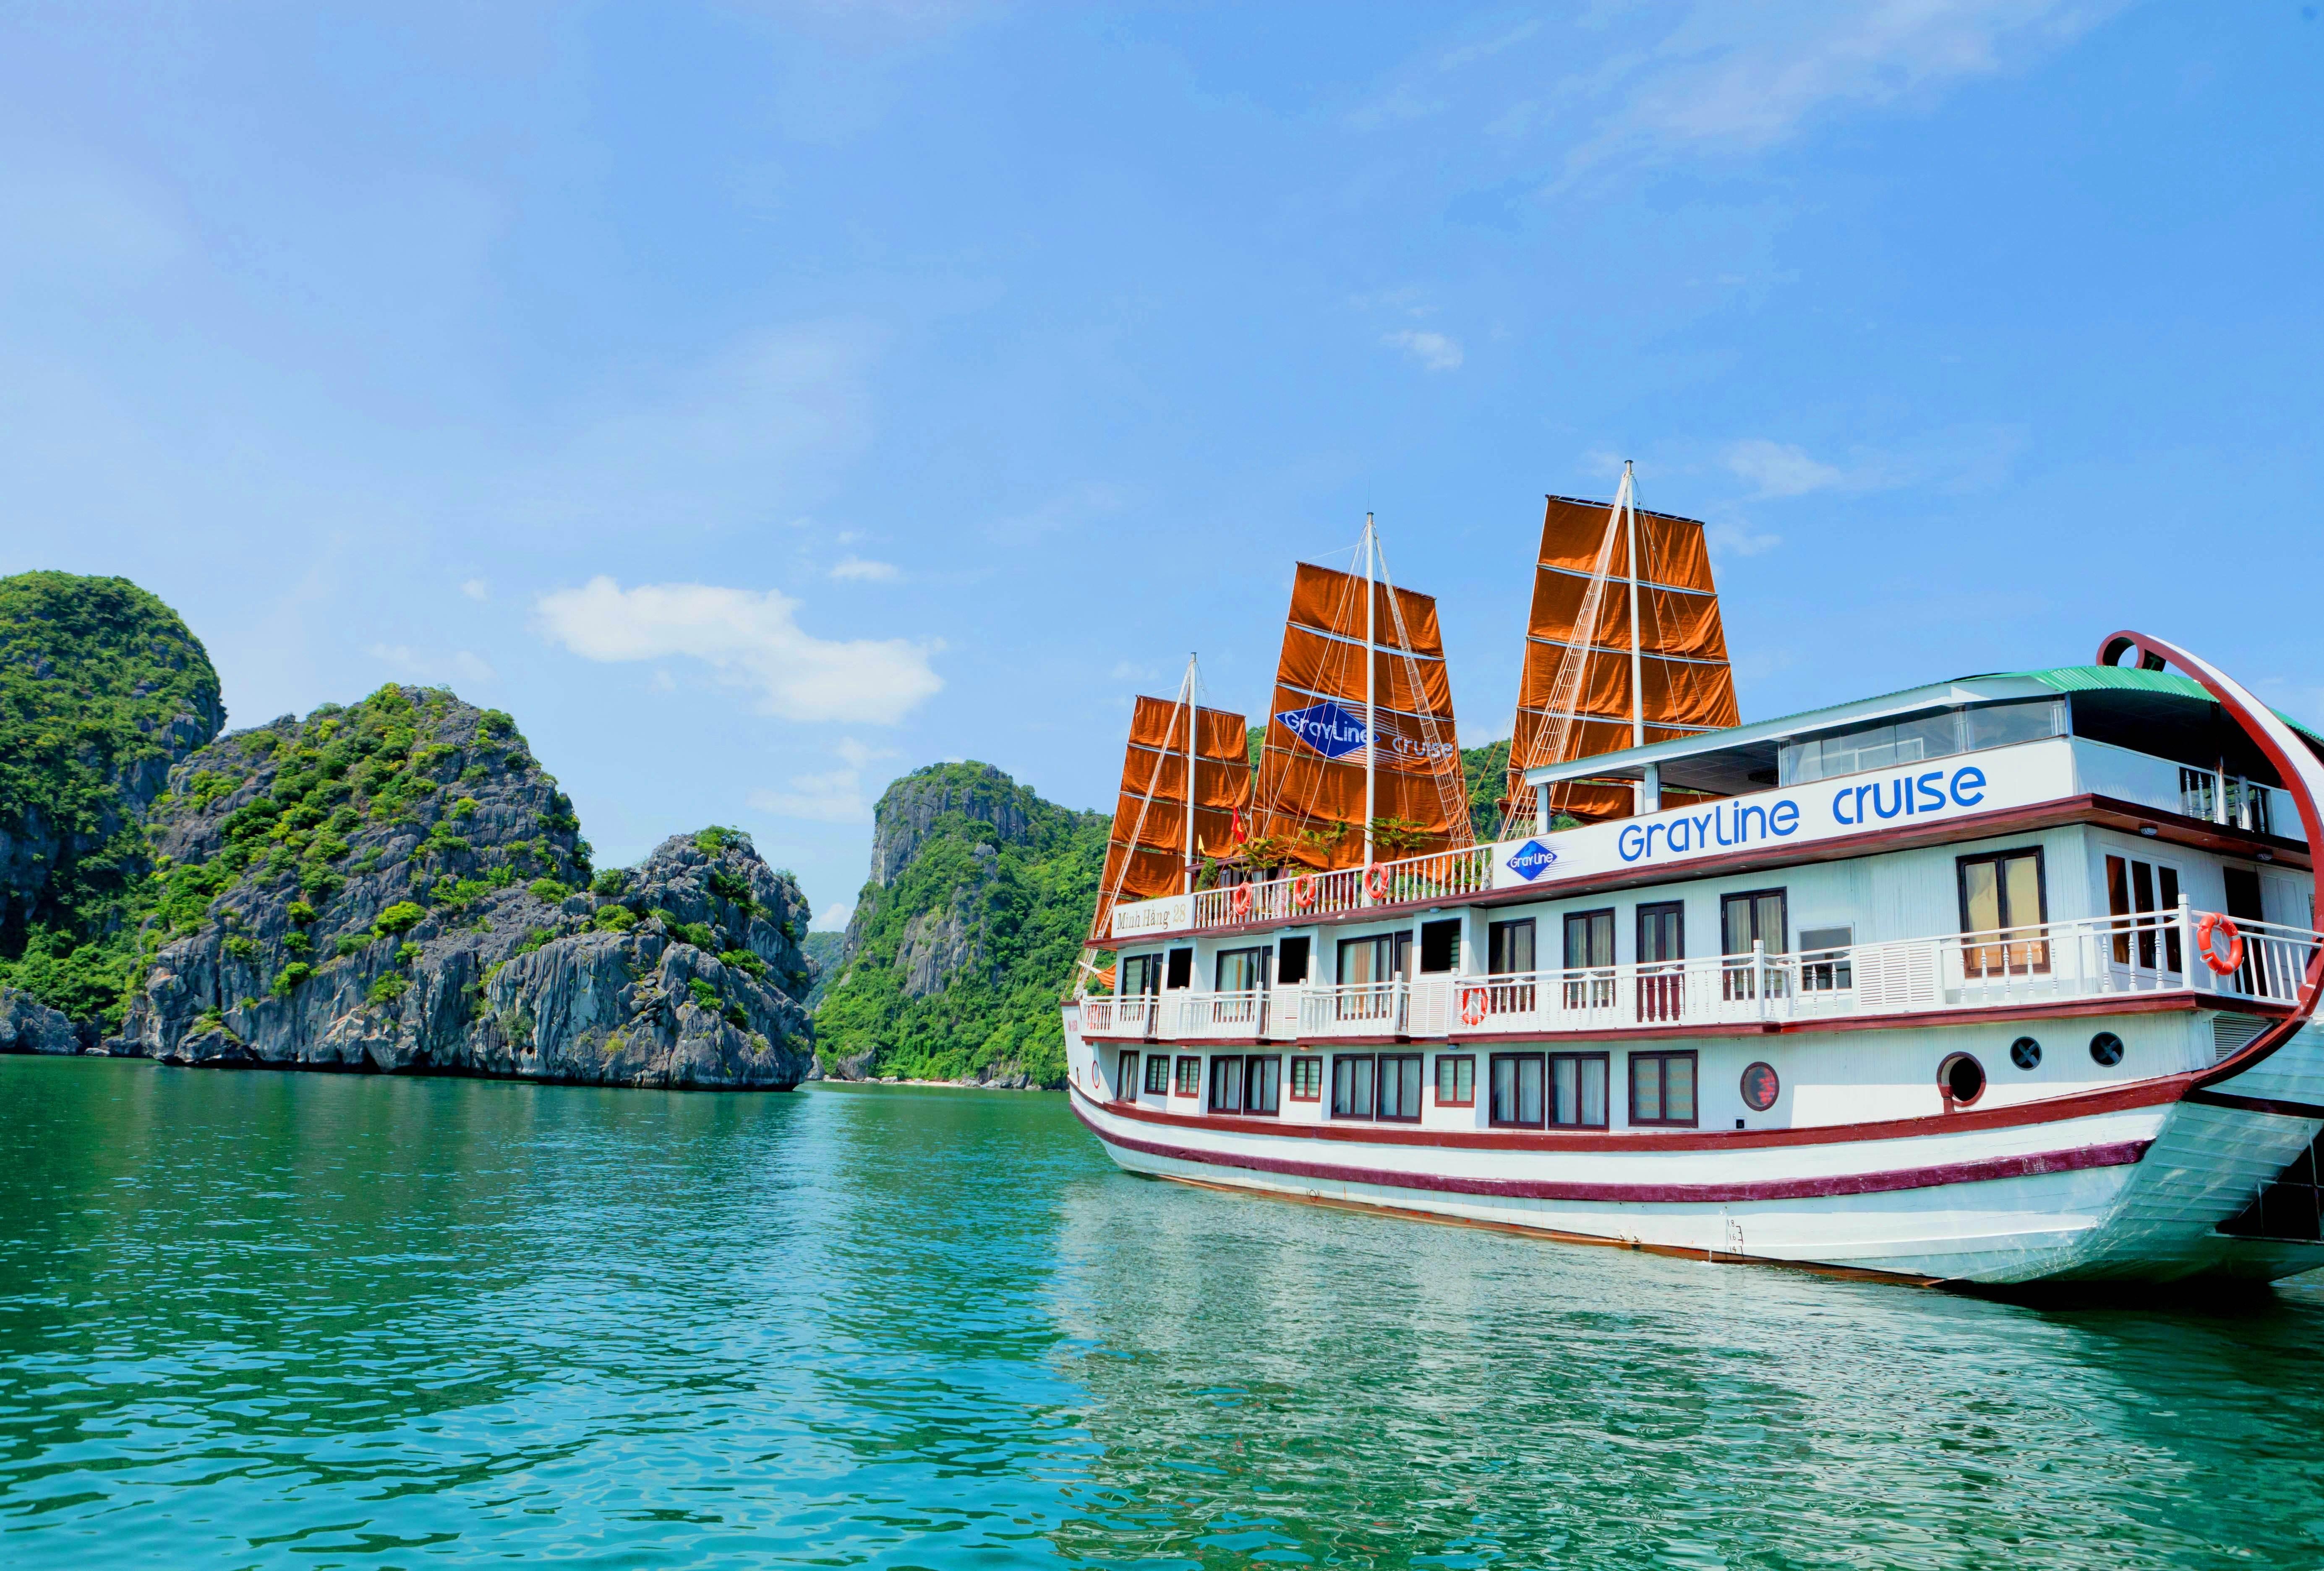 Halong bay, Sights & Activities in Halong, Halong tours